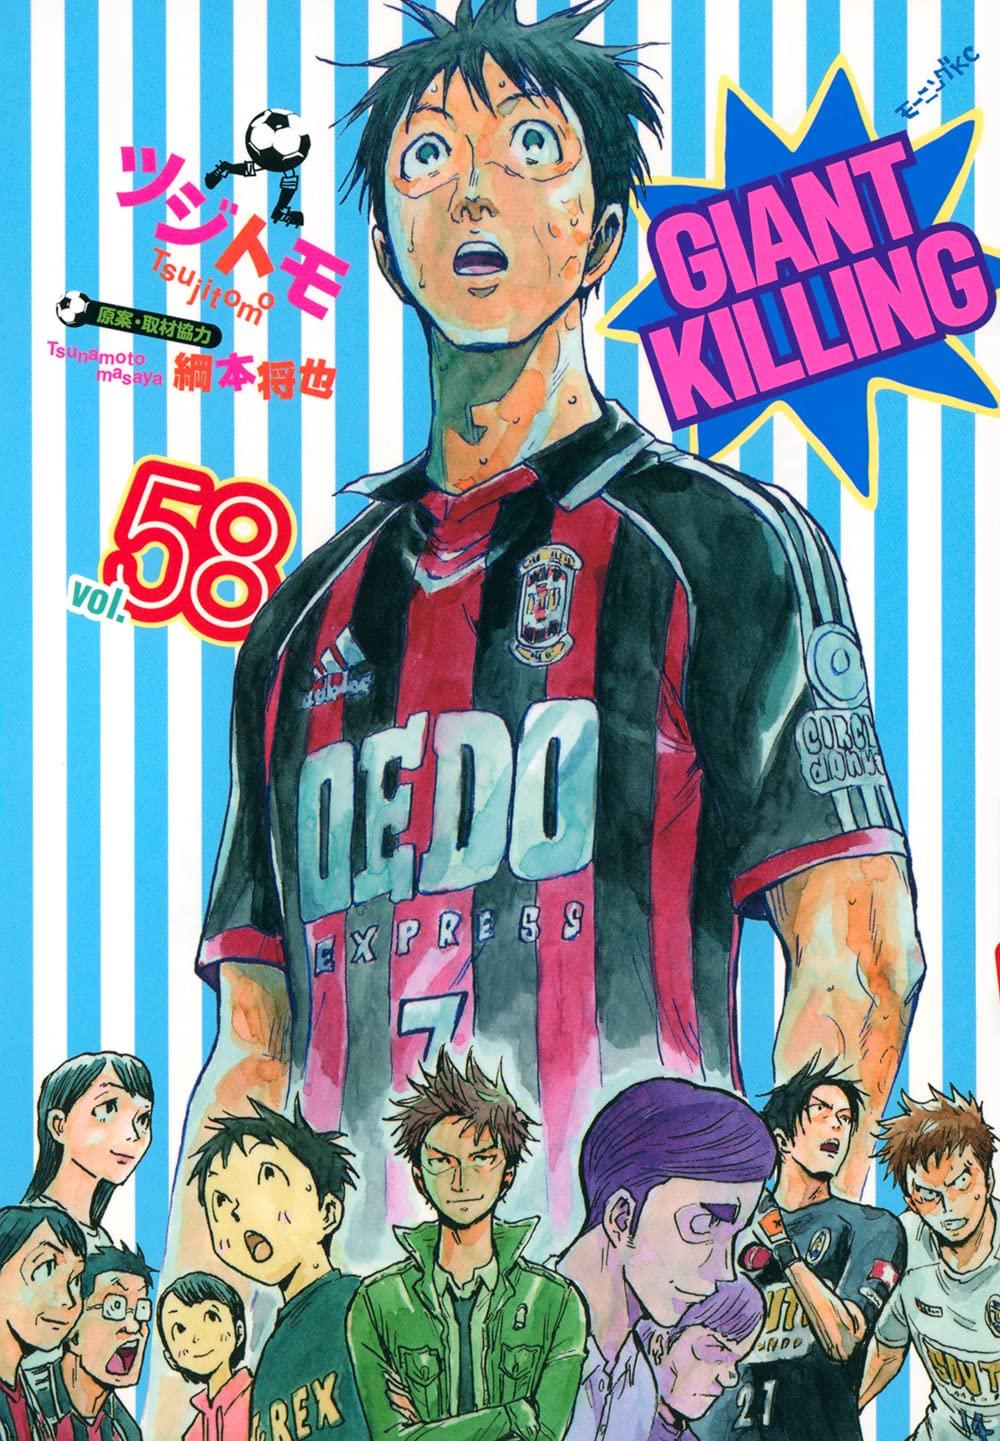 Giant Killing 58